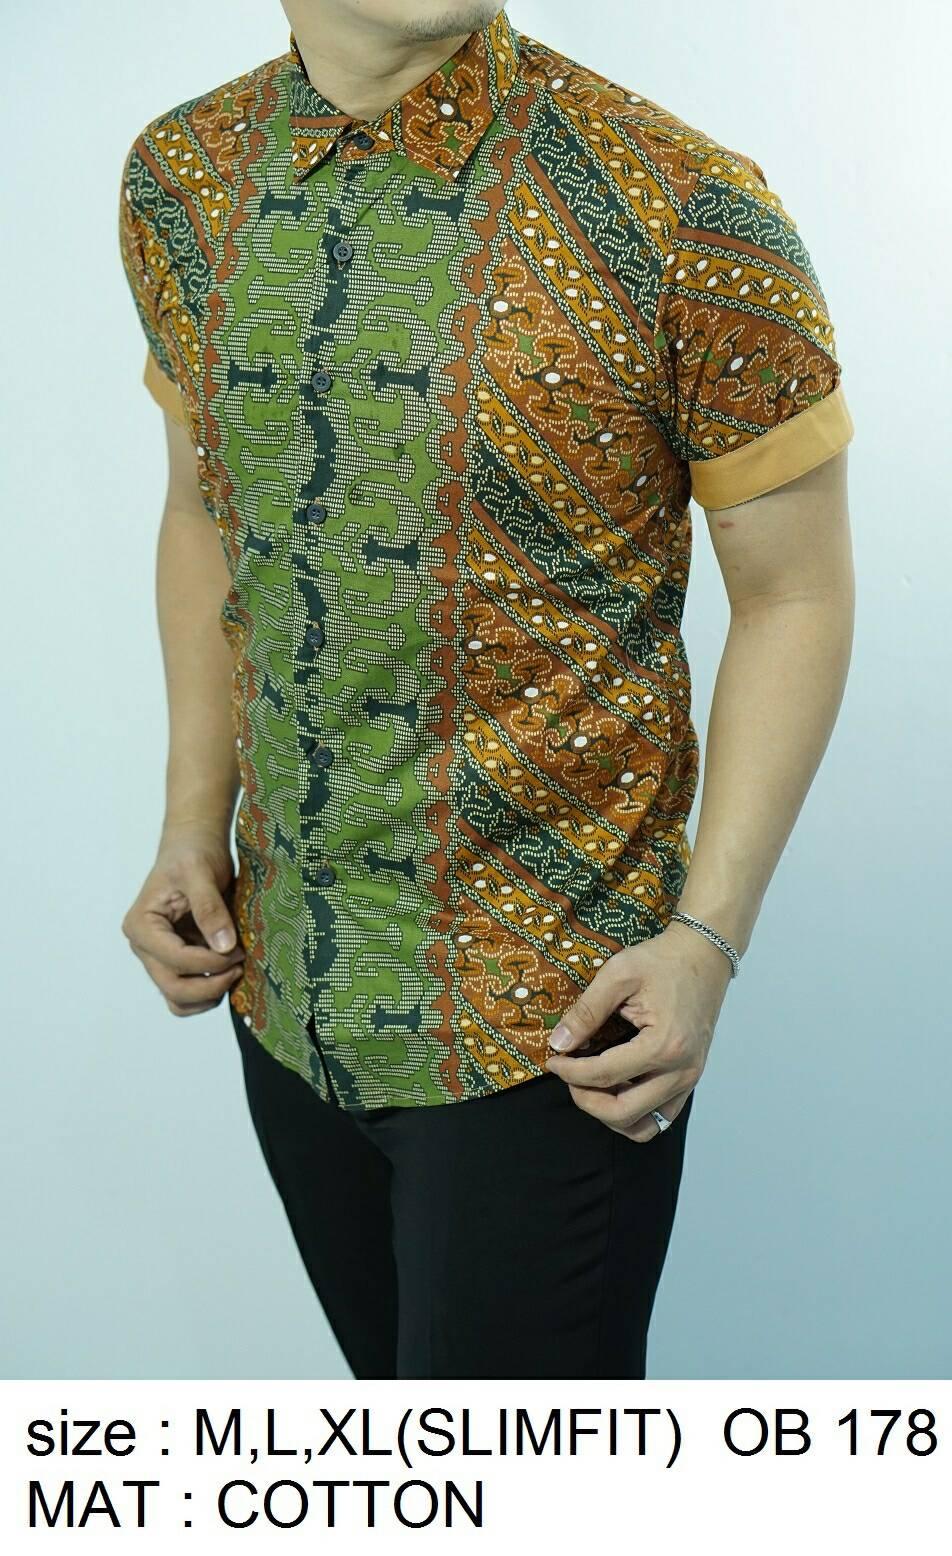 Batik Slim Fit - Kualitas Mall Elite!! Kemeja Slimfit Keren OB178